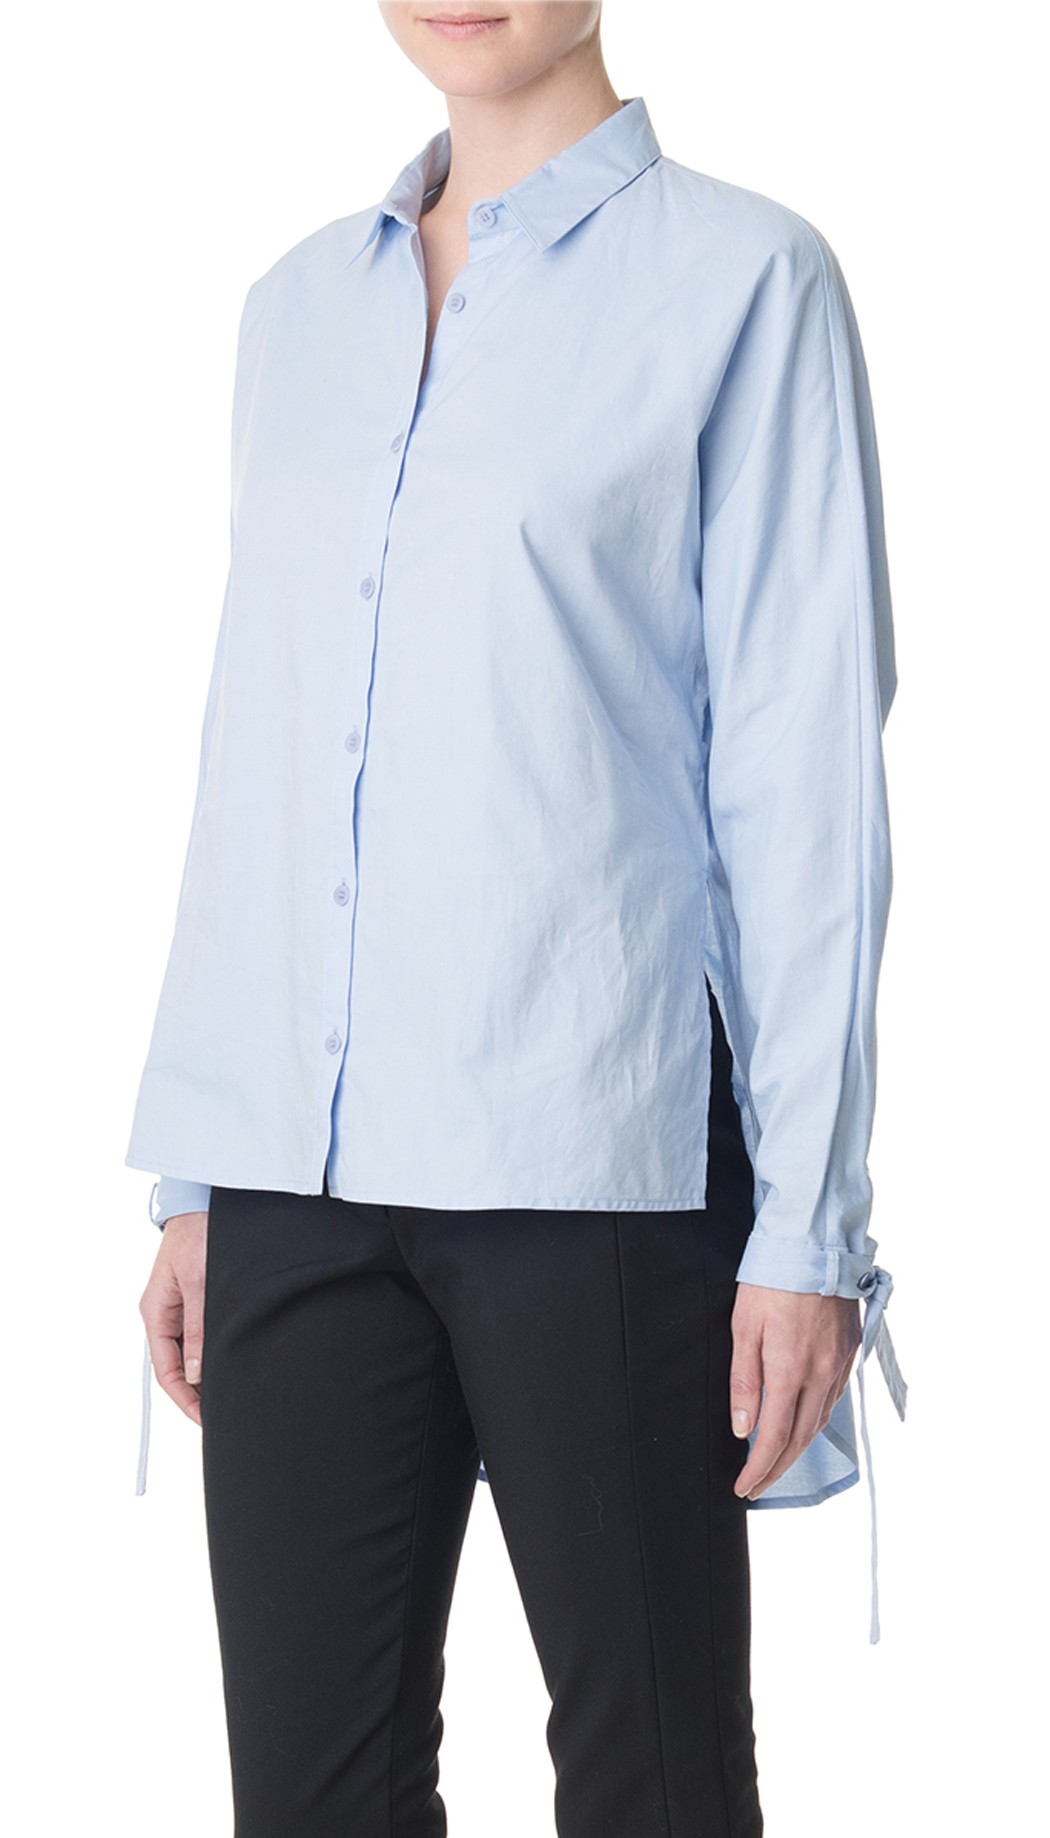 Tibi Oxford Dolman Tie Shirt In Blue Light Blue Lyst